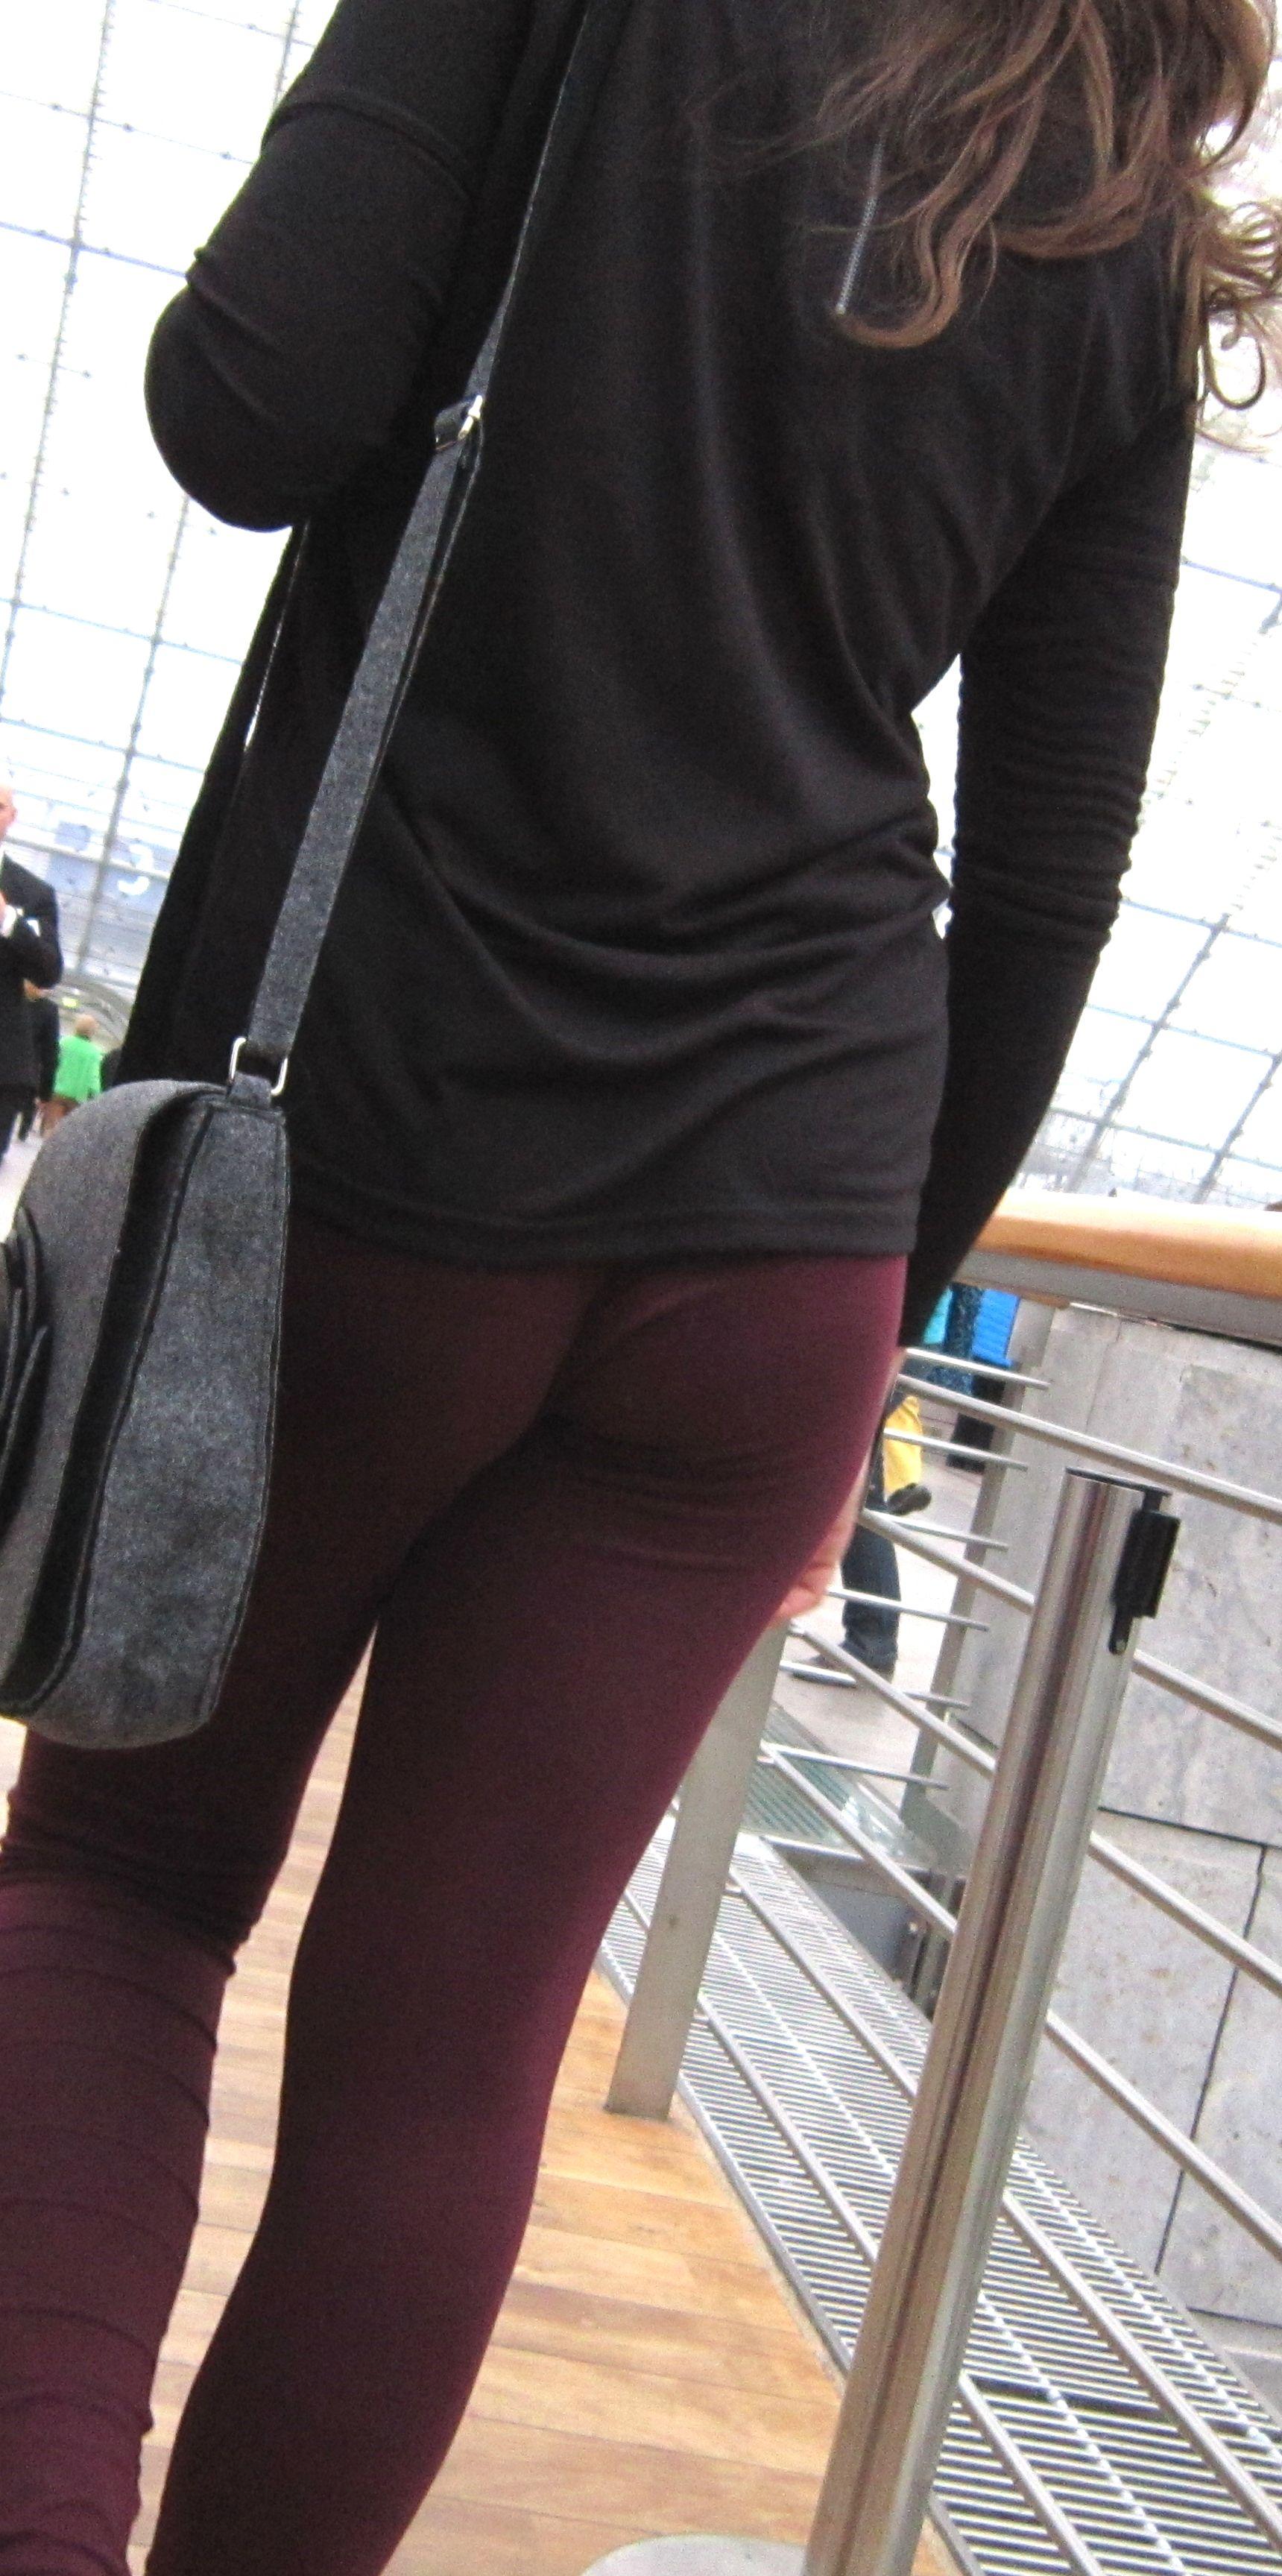 Booty in Black Yoga Pants Closeups - Sexy Candid Girls